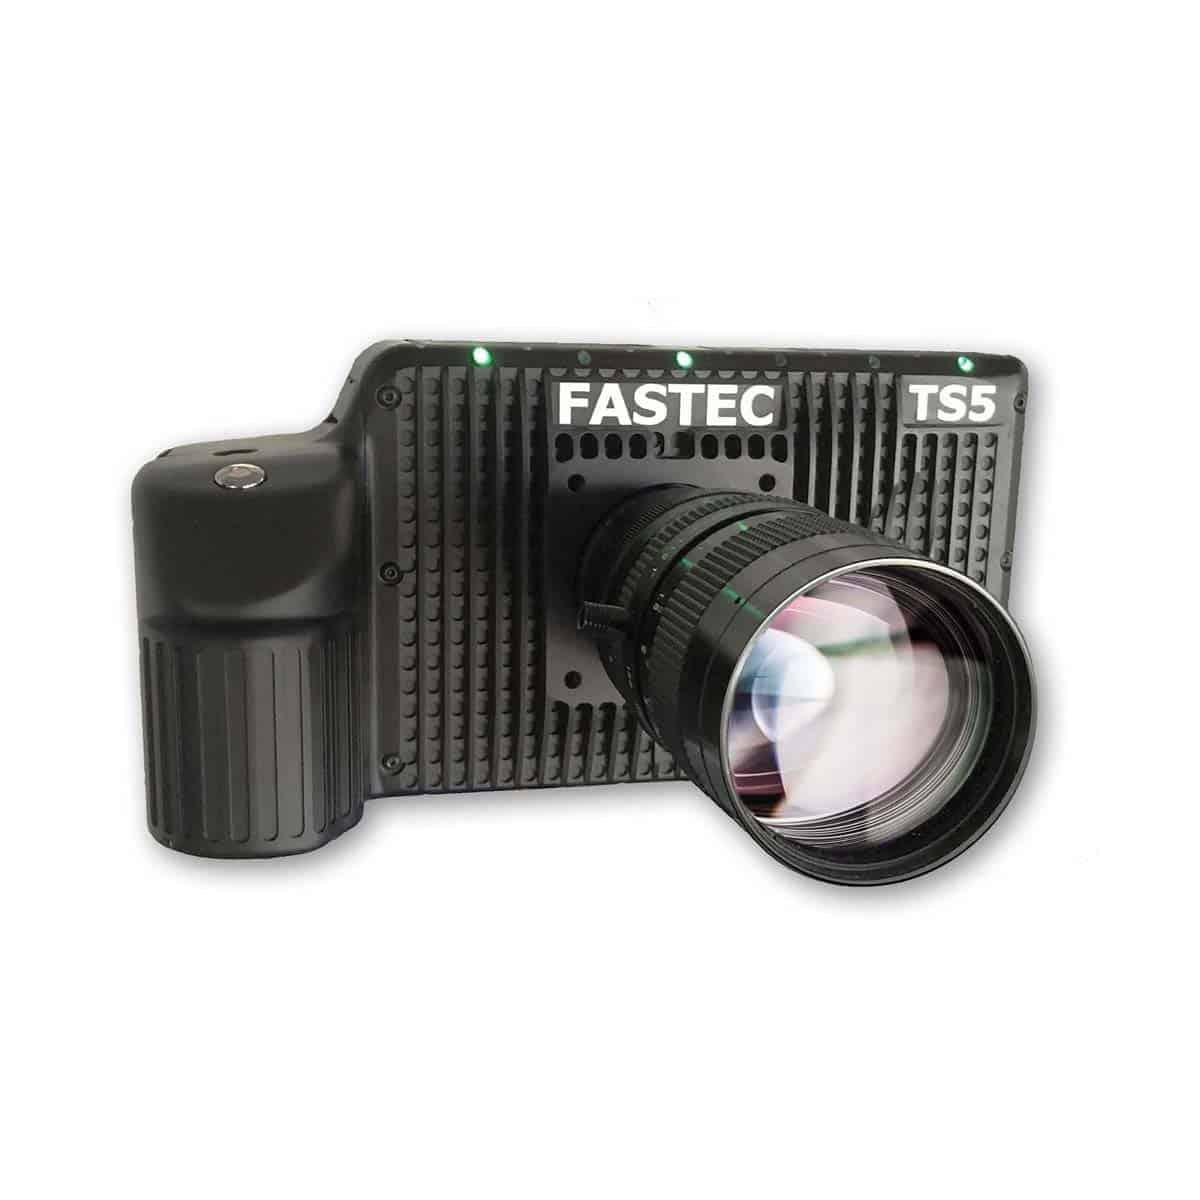 cameras rapides gamme fastec modèle imaging TS5